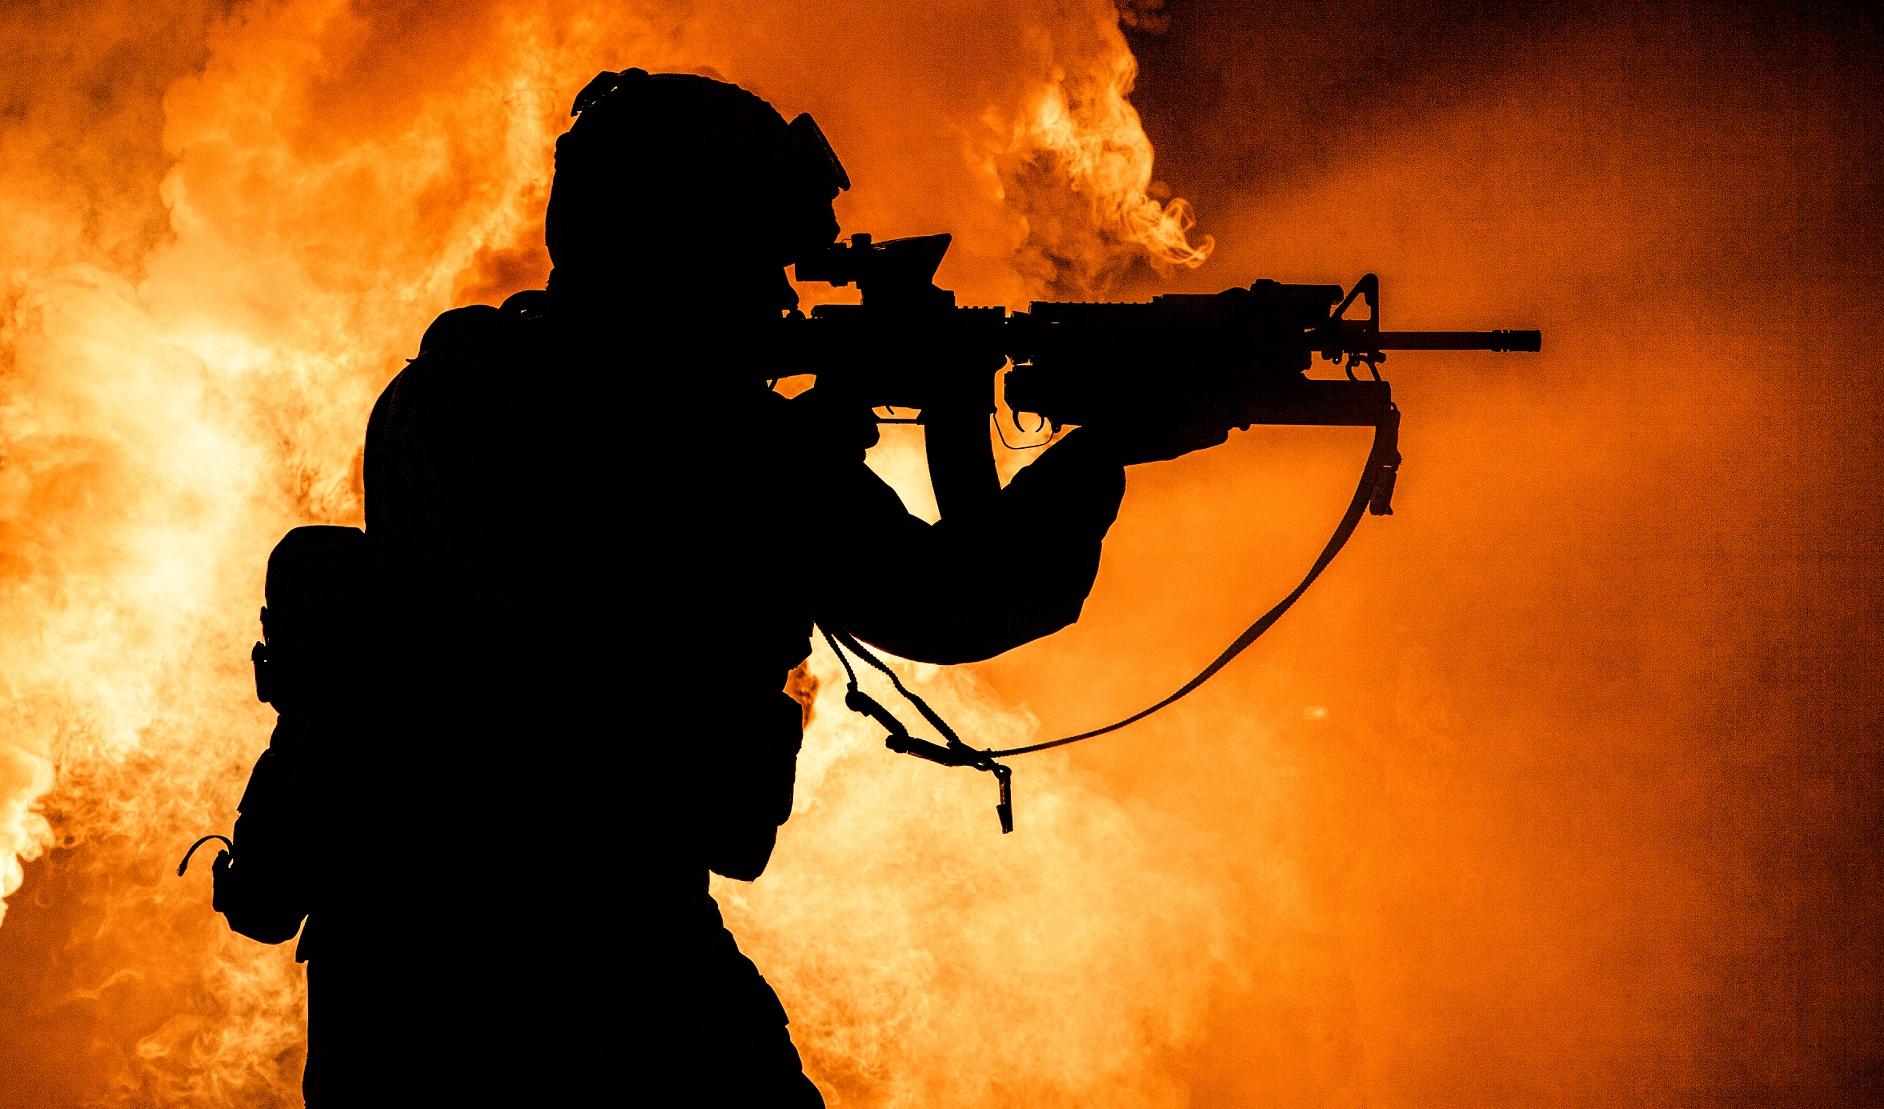 soldiers silhouette on background of fire explosio M5P3NKE Ливия Ливия